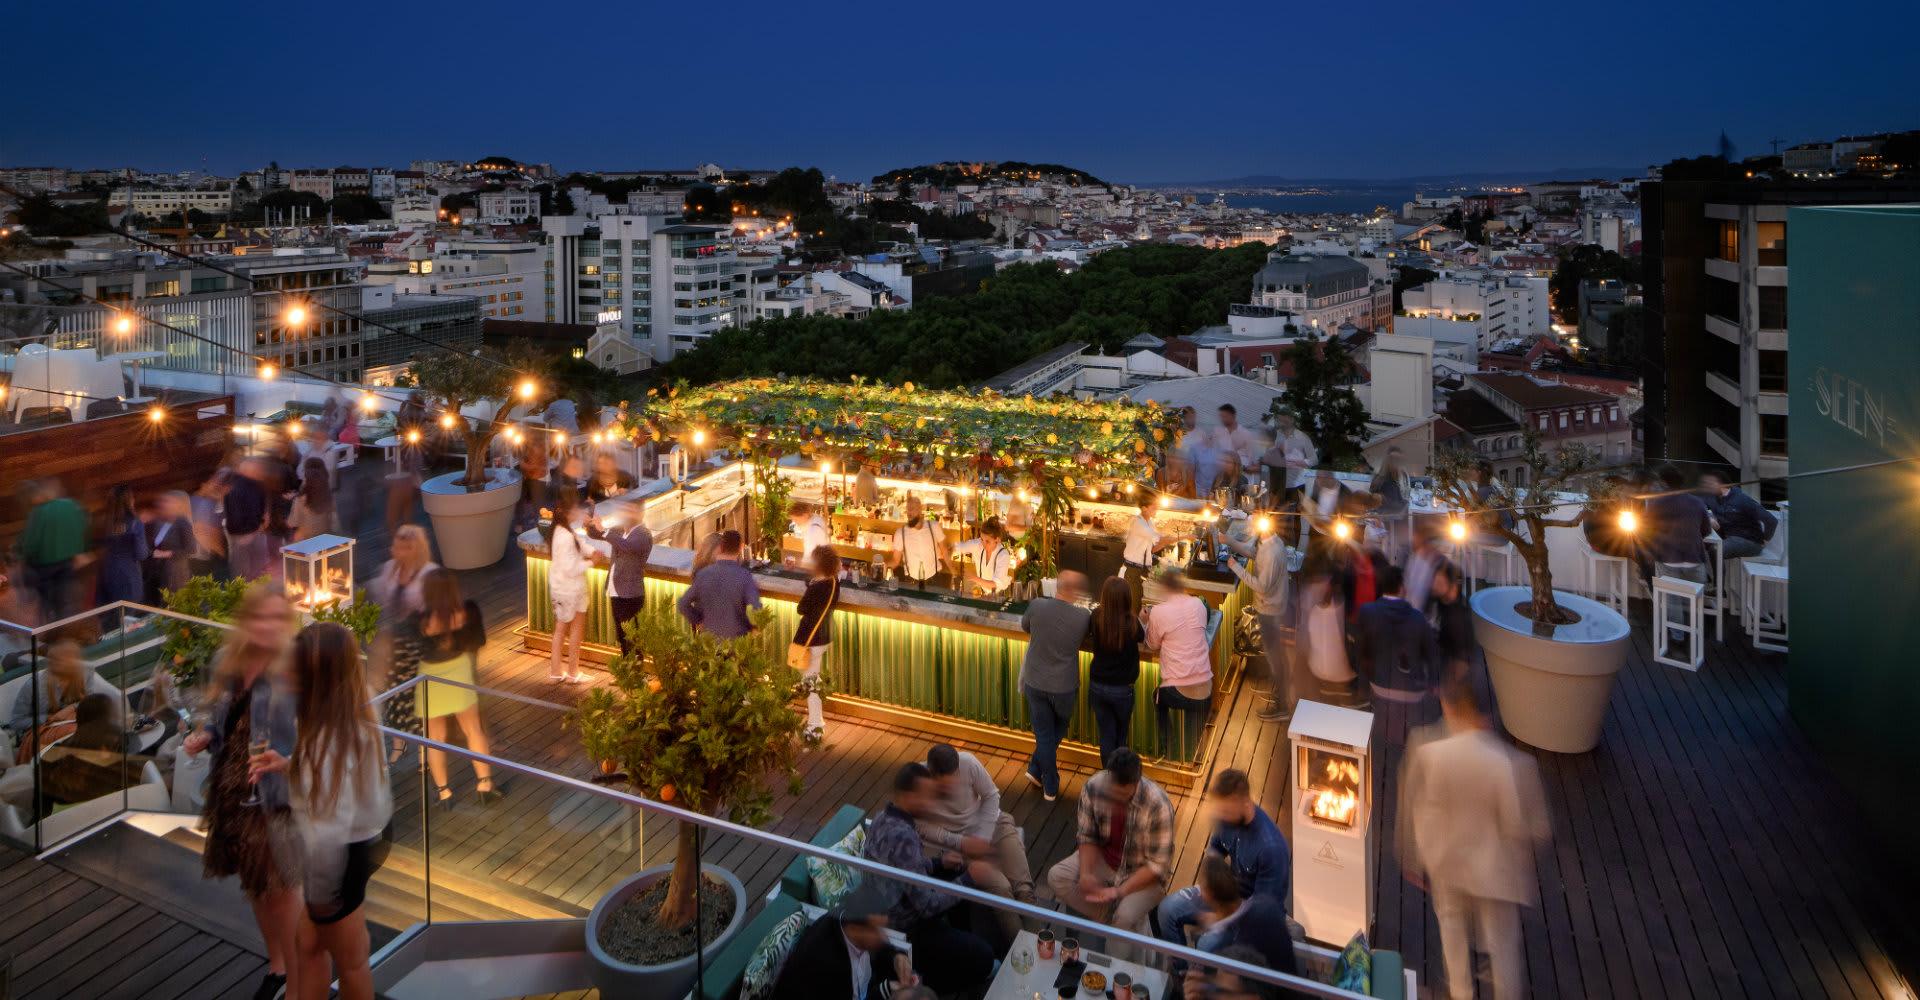 Lisboa Rooftop Bar Sky Bar By Seen At Tivoli Avenida